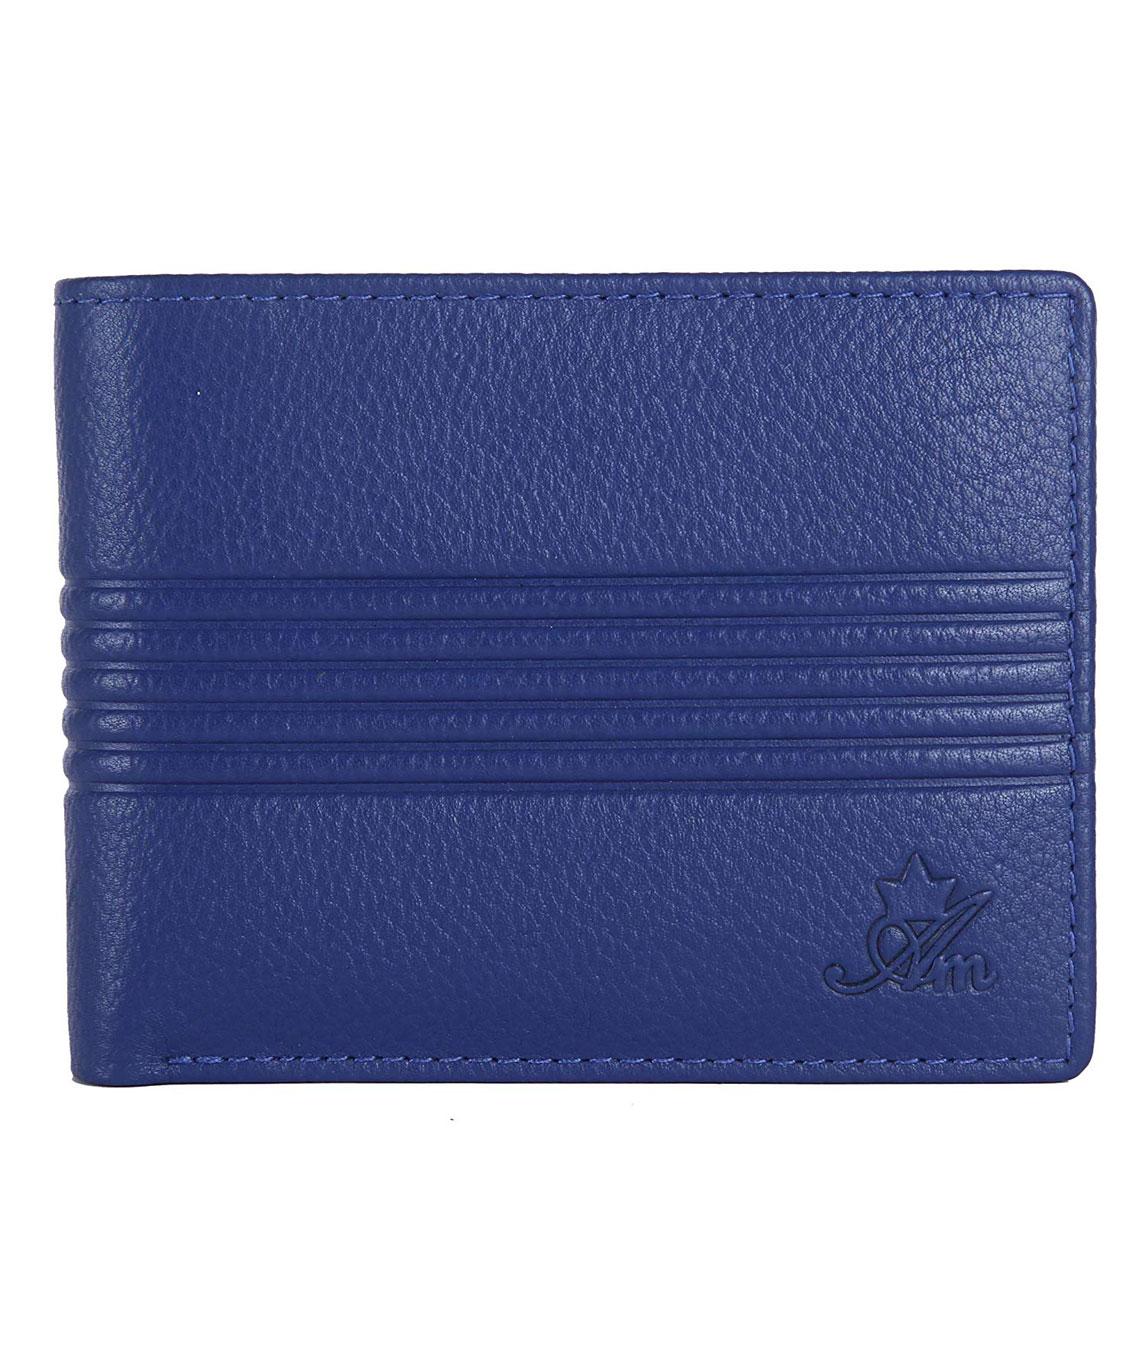 AM LEATHER Leather Bi-Fold Blue Men`s Wallet